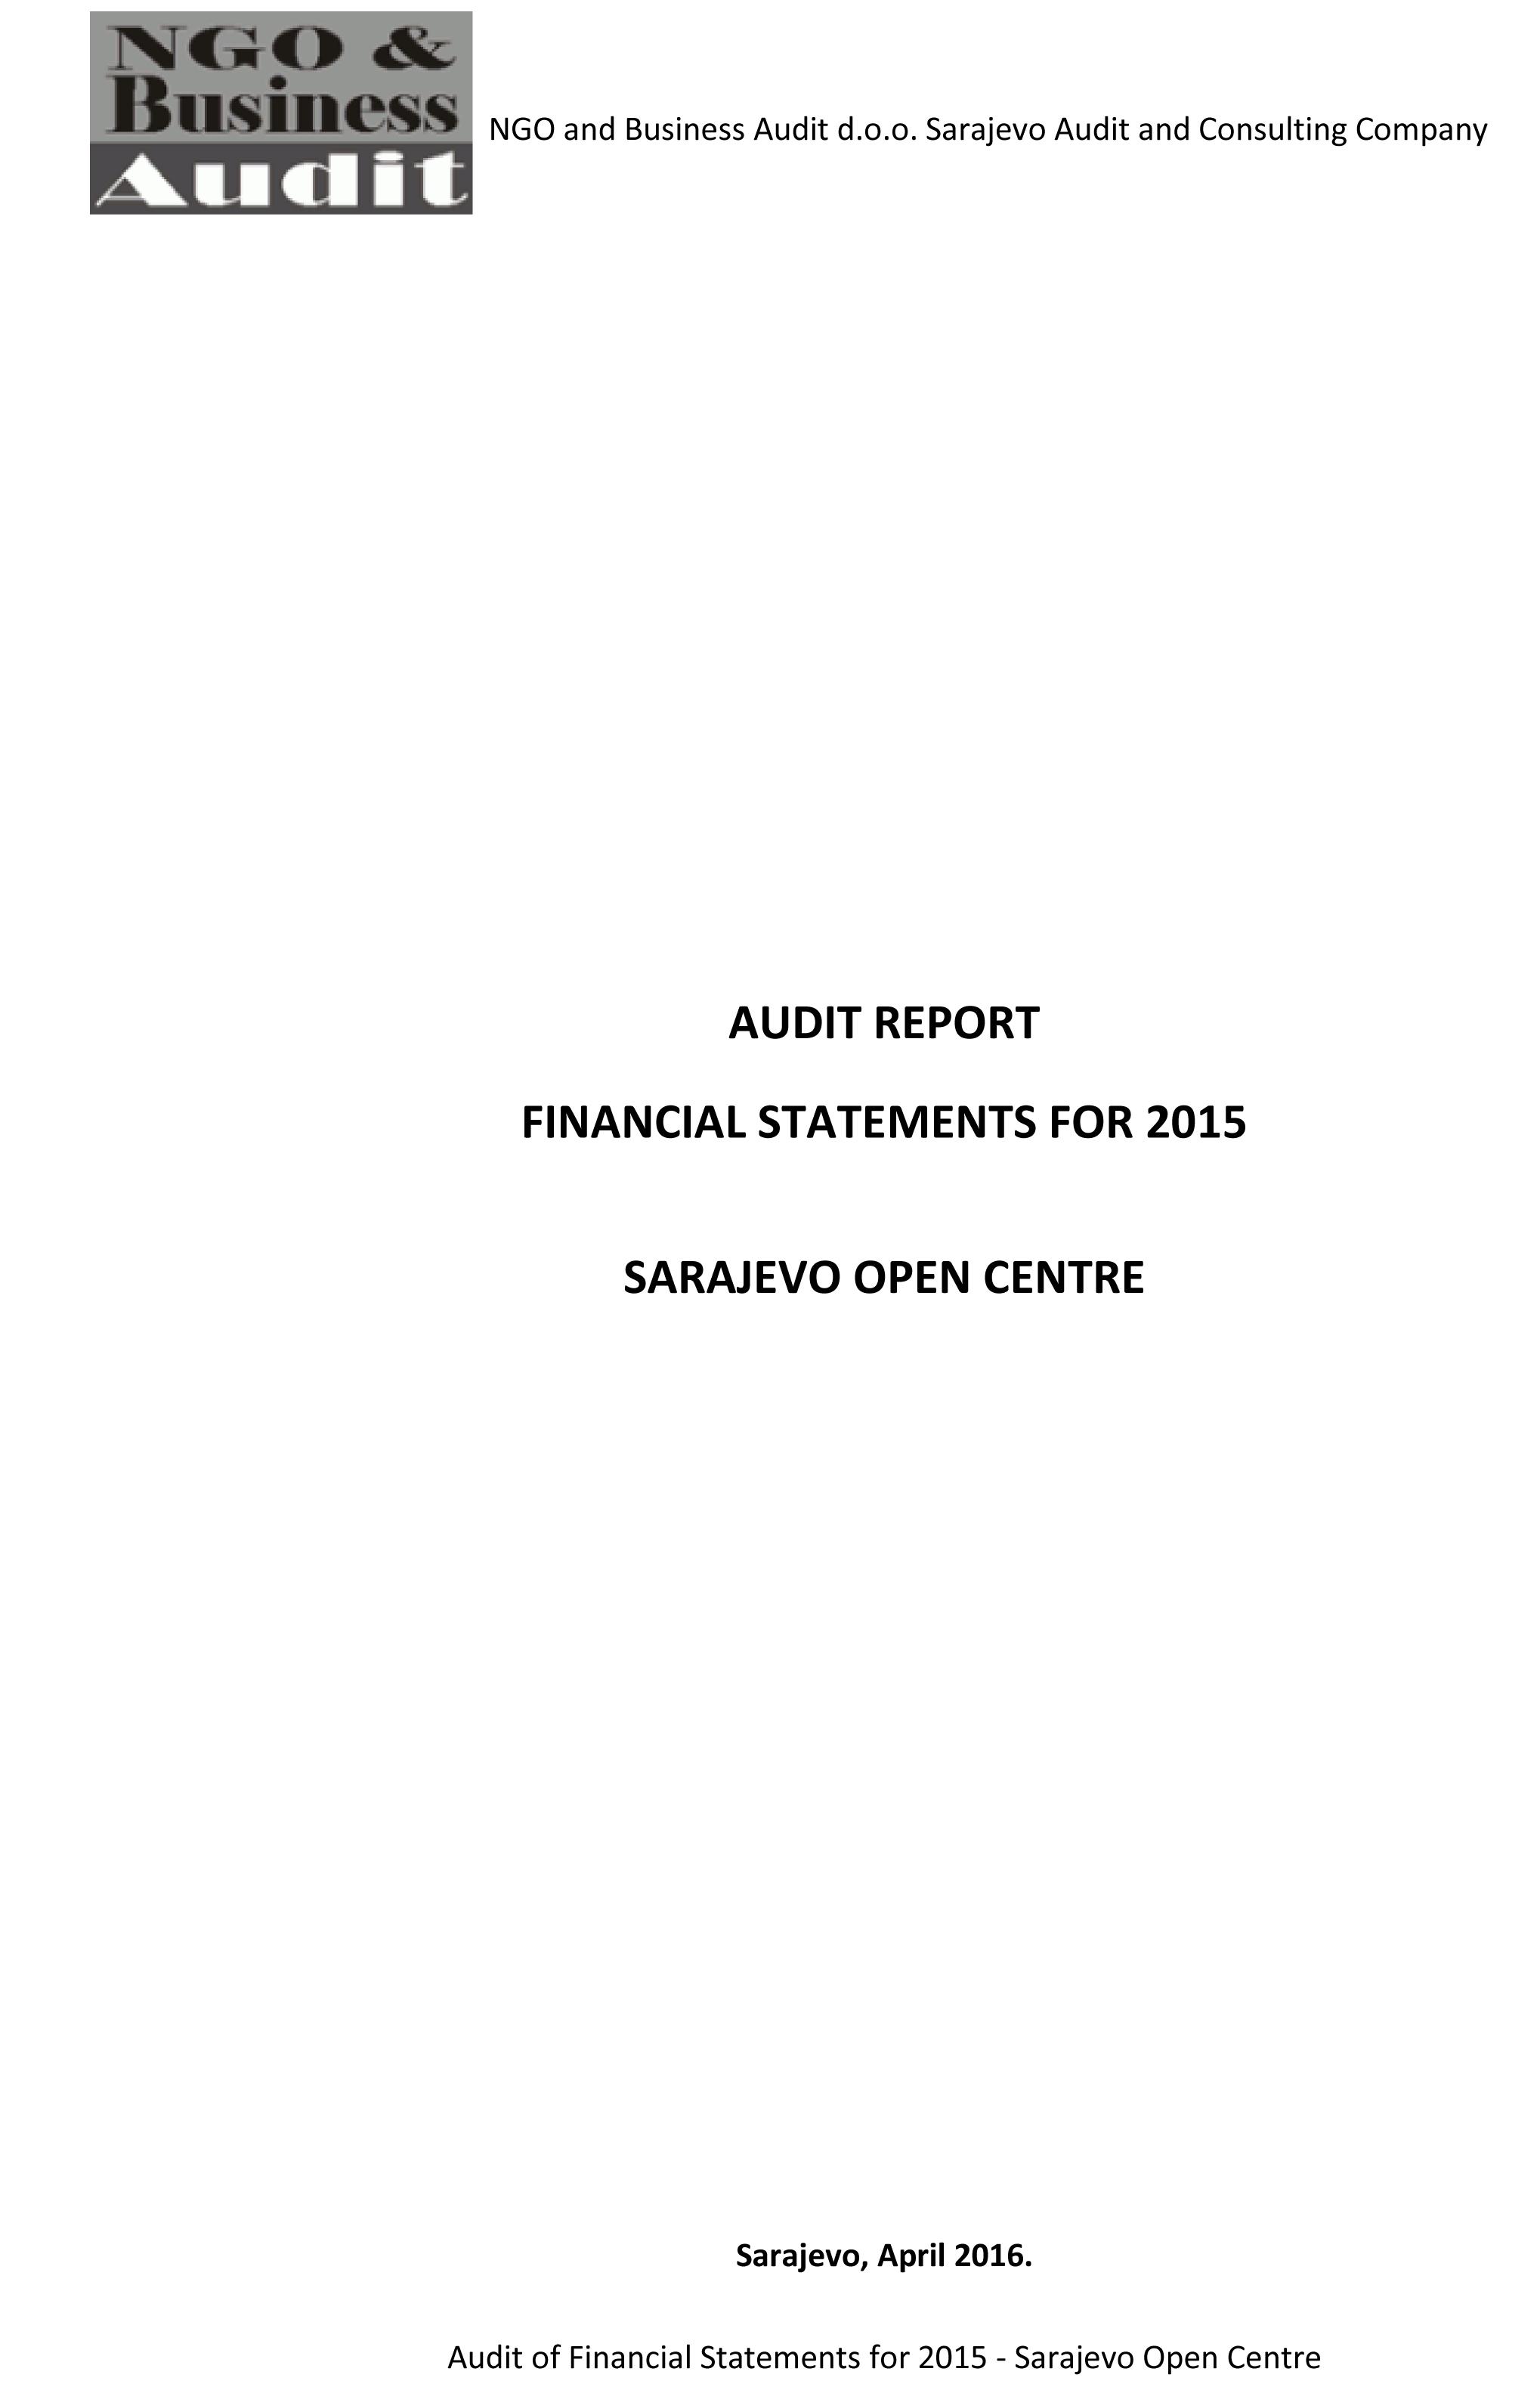 Final audit report SOC 2015 signed